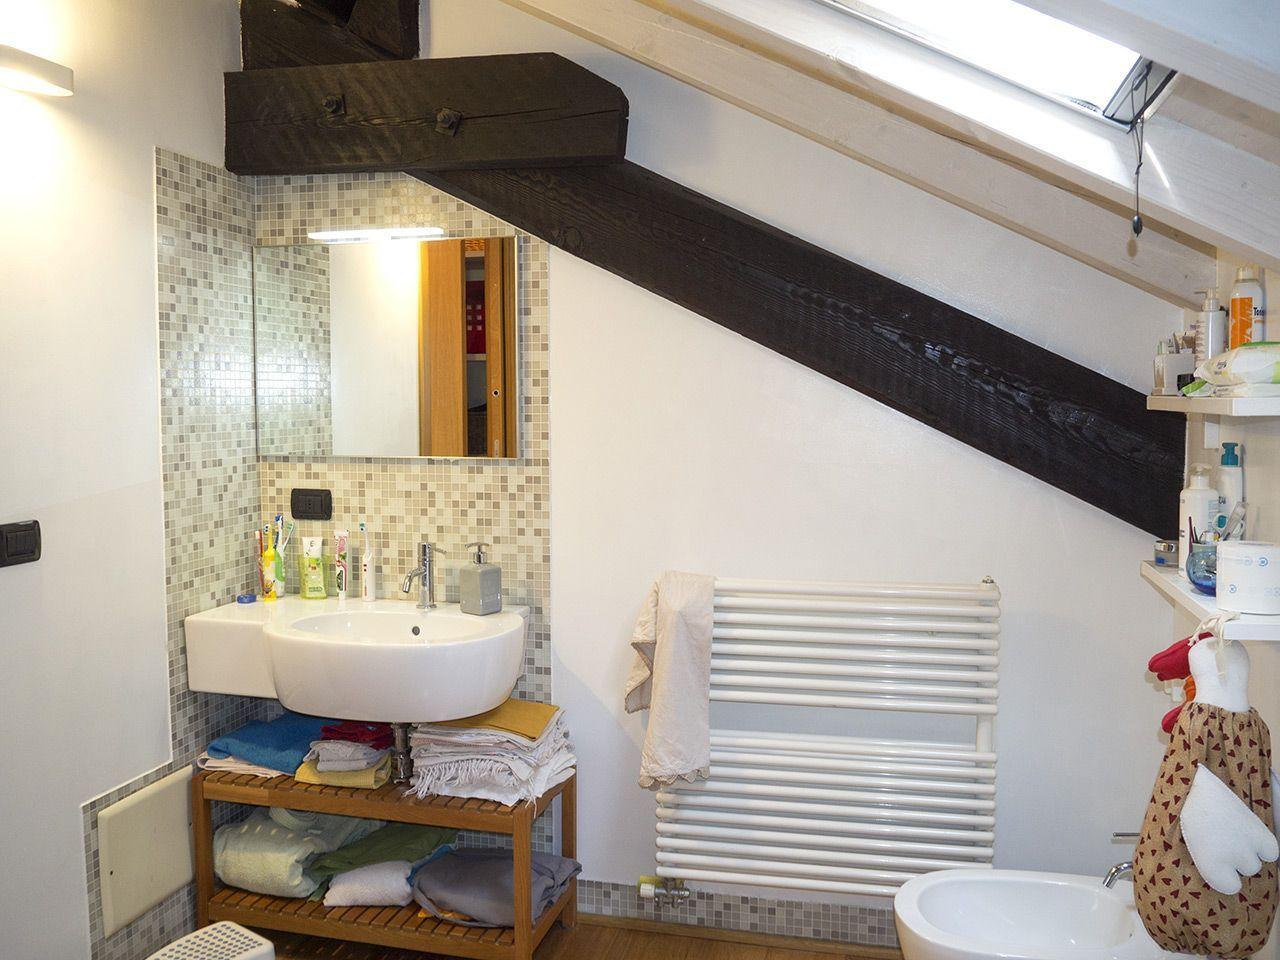 Three-room apartment in Verbania - bathroom